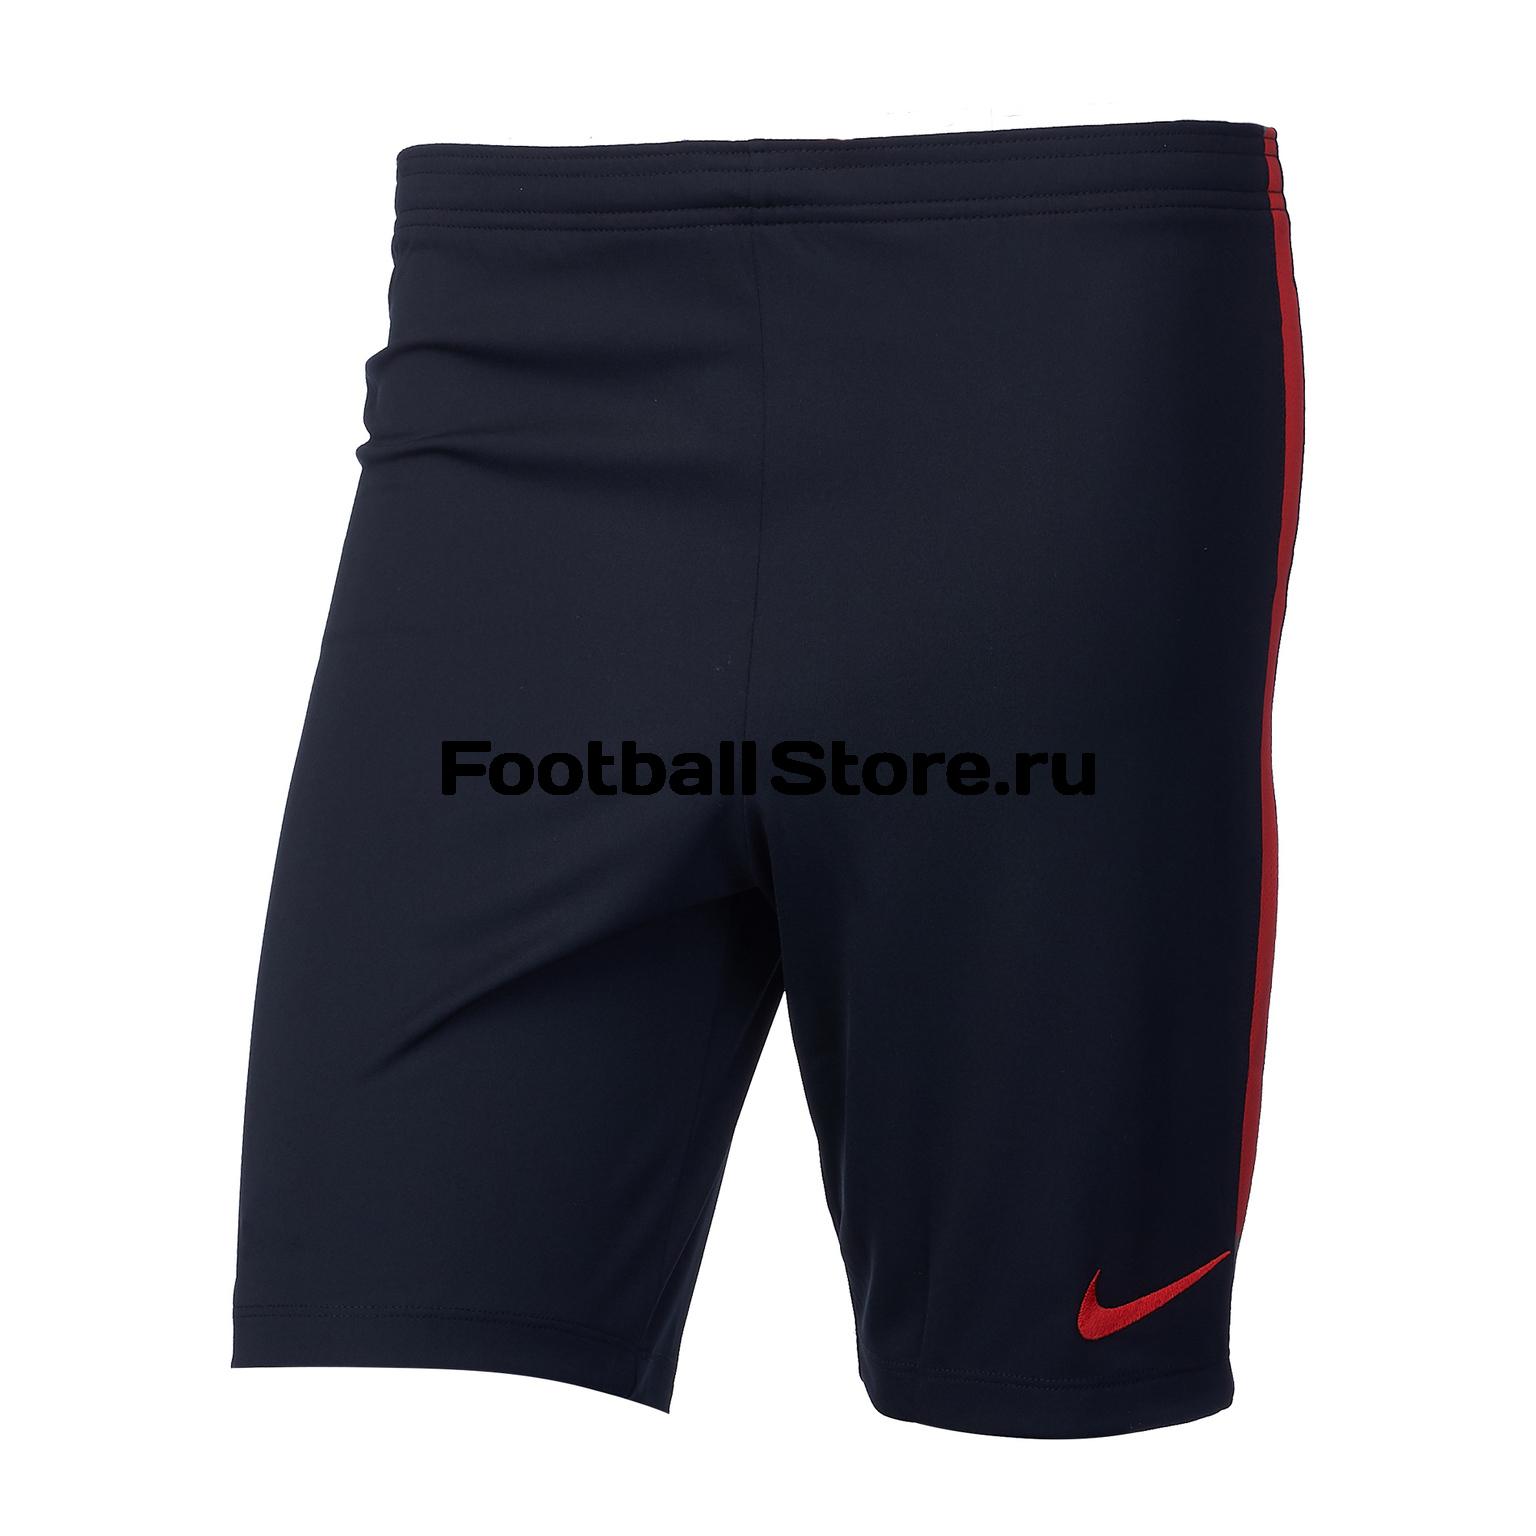 Шорты тренировочные Nike DRY ACDMY Short 832508-021 original new arrival 2018 nike dry acdmy pant kpz men s pants sportswear